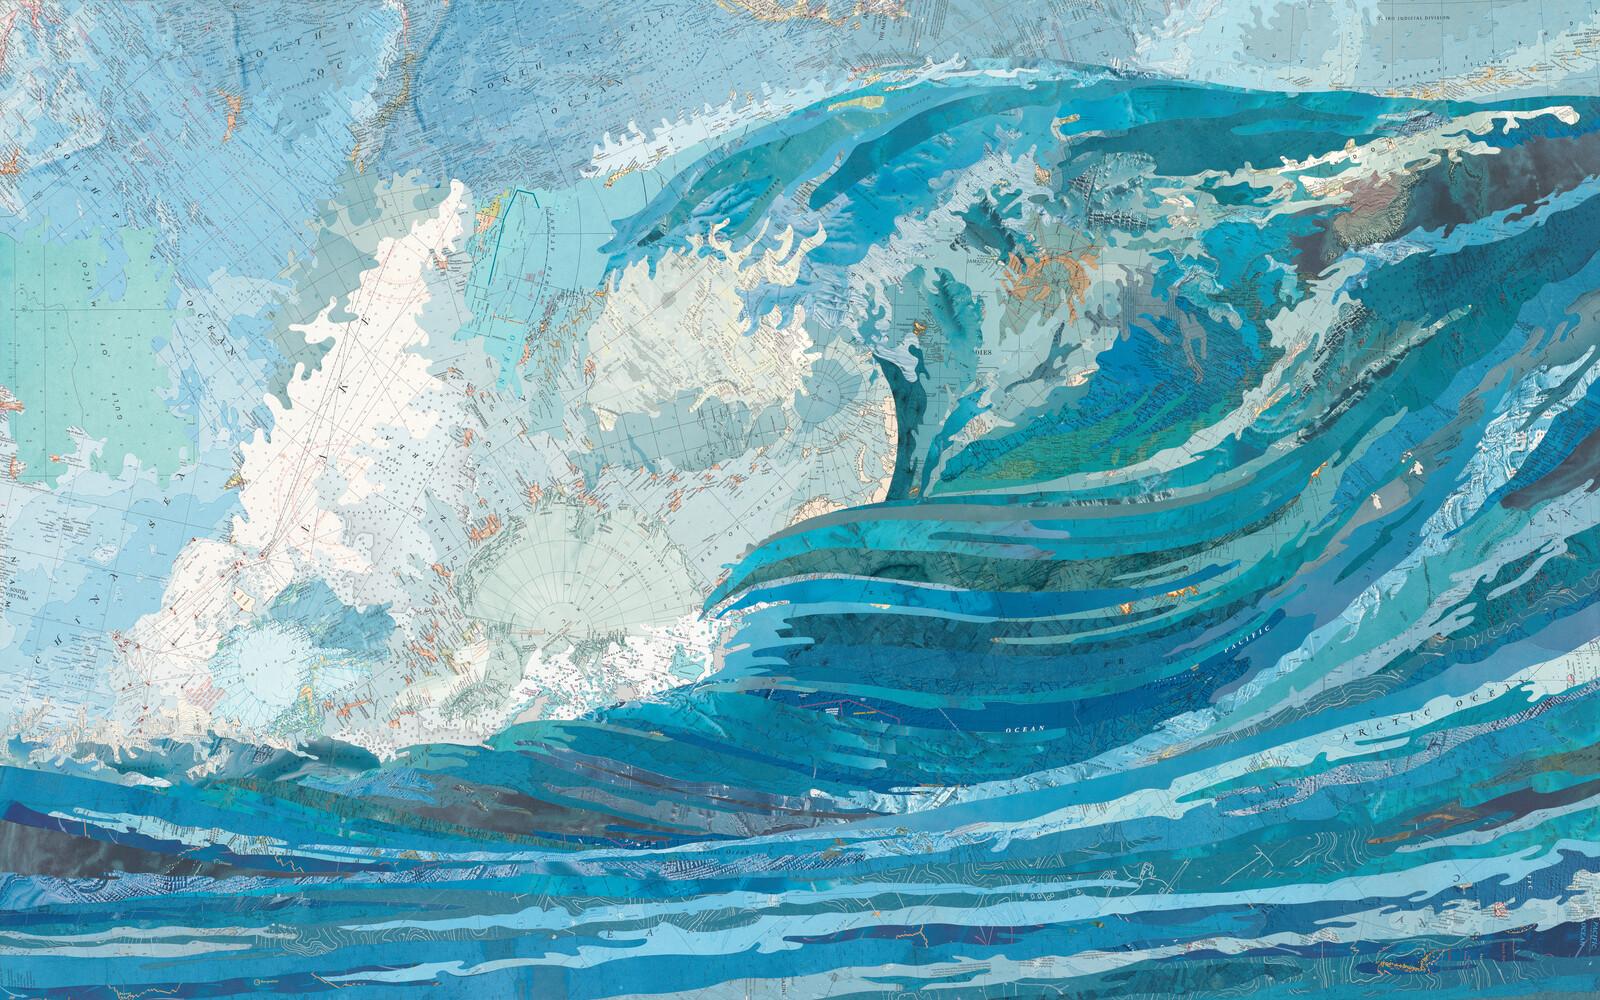 Irene's Wave - Matthew Cusick